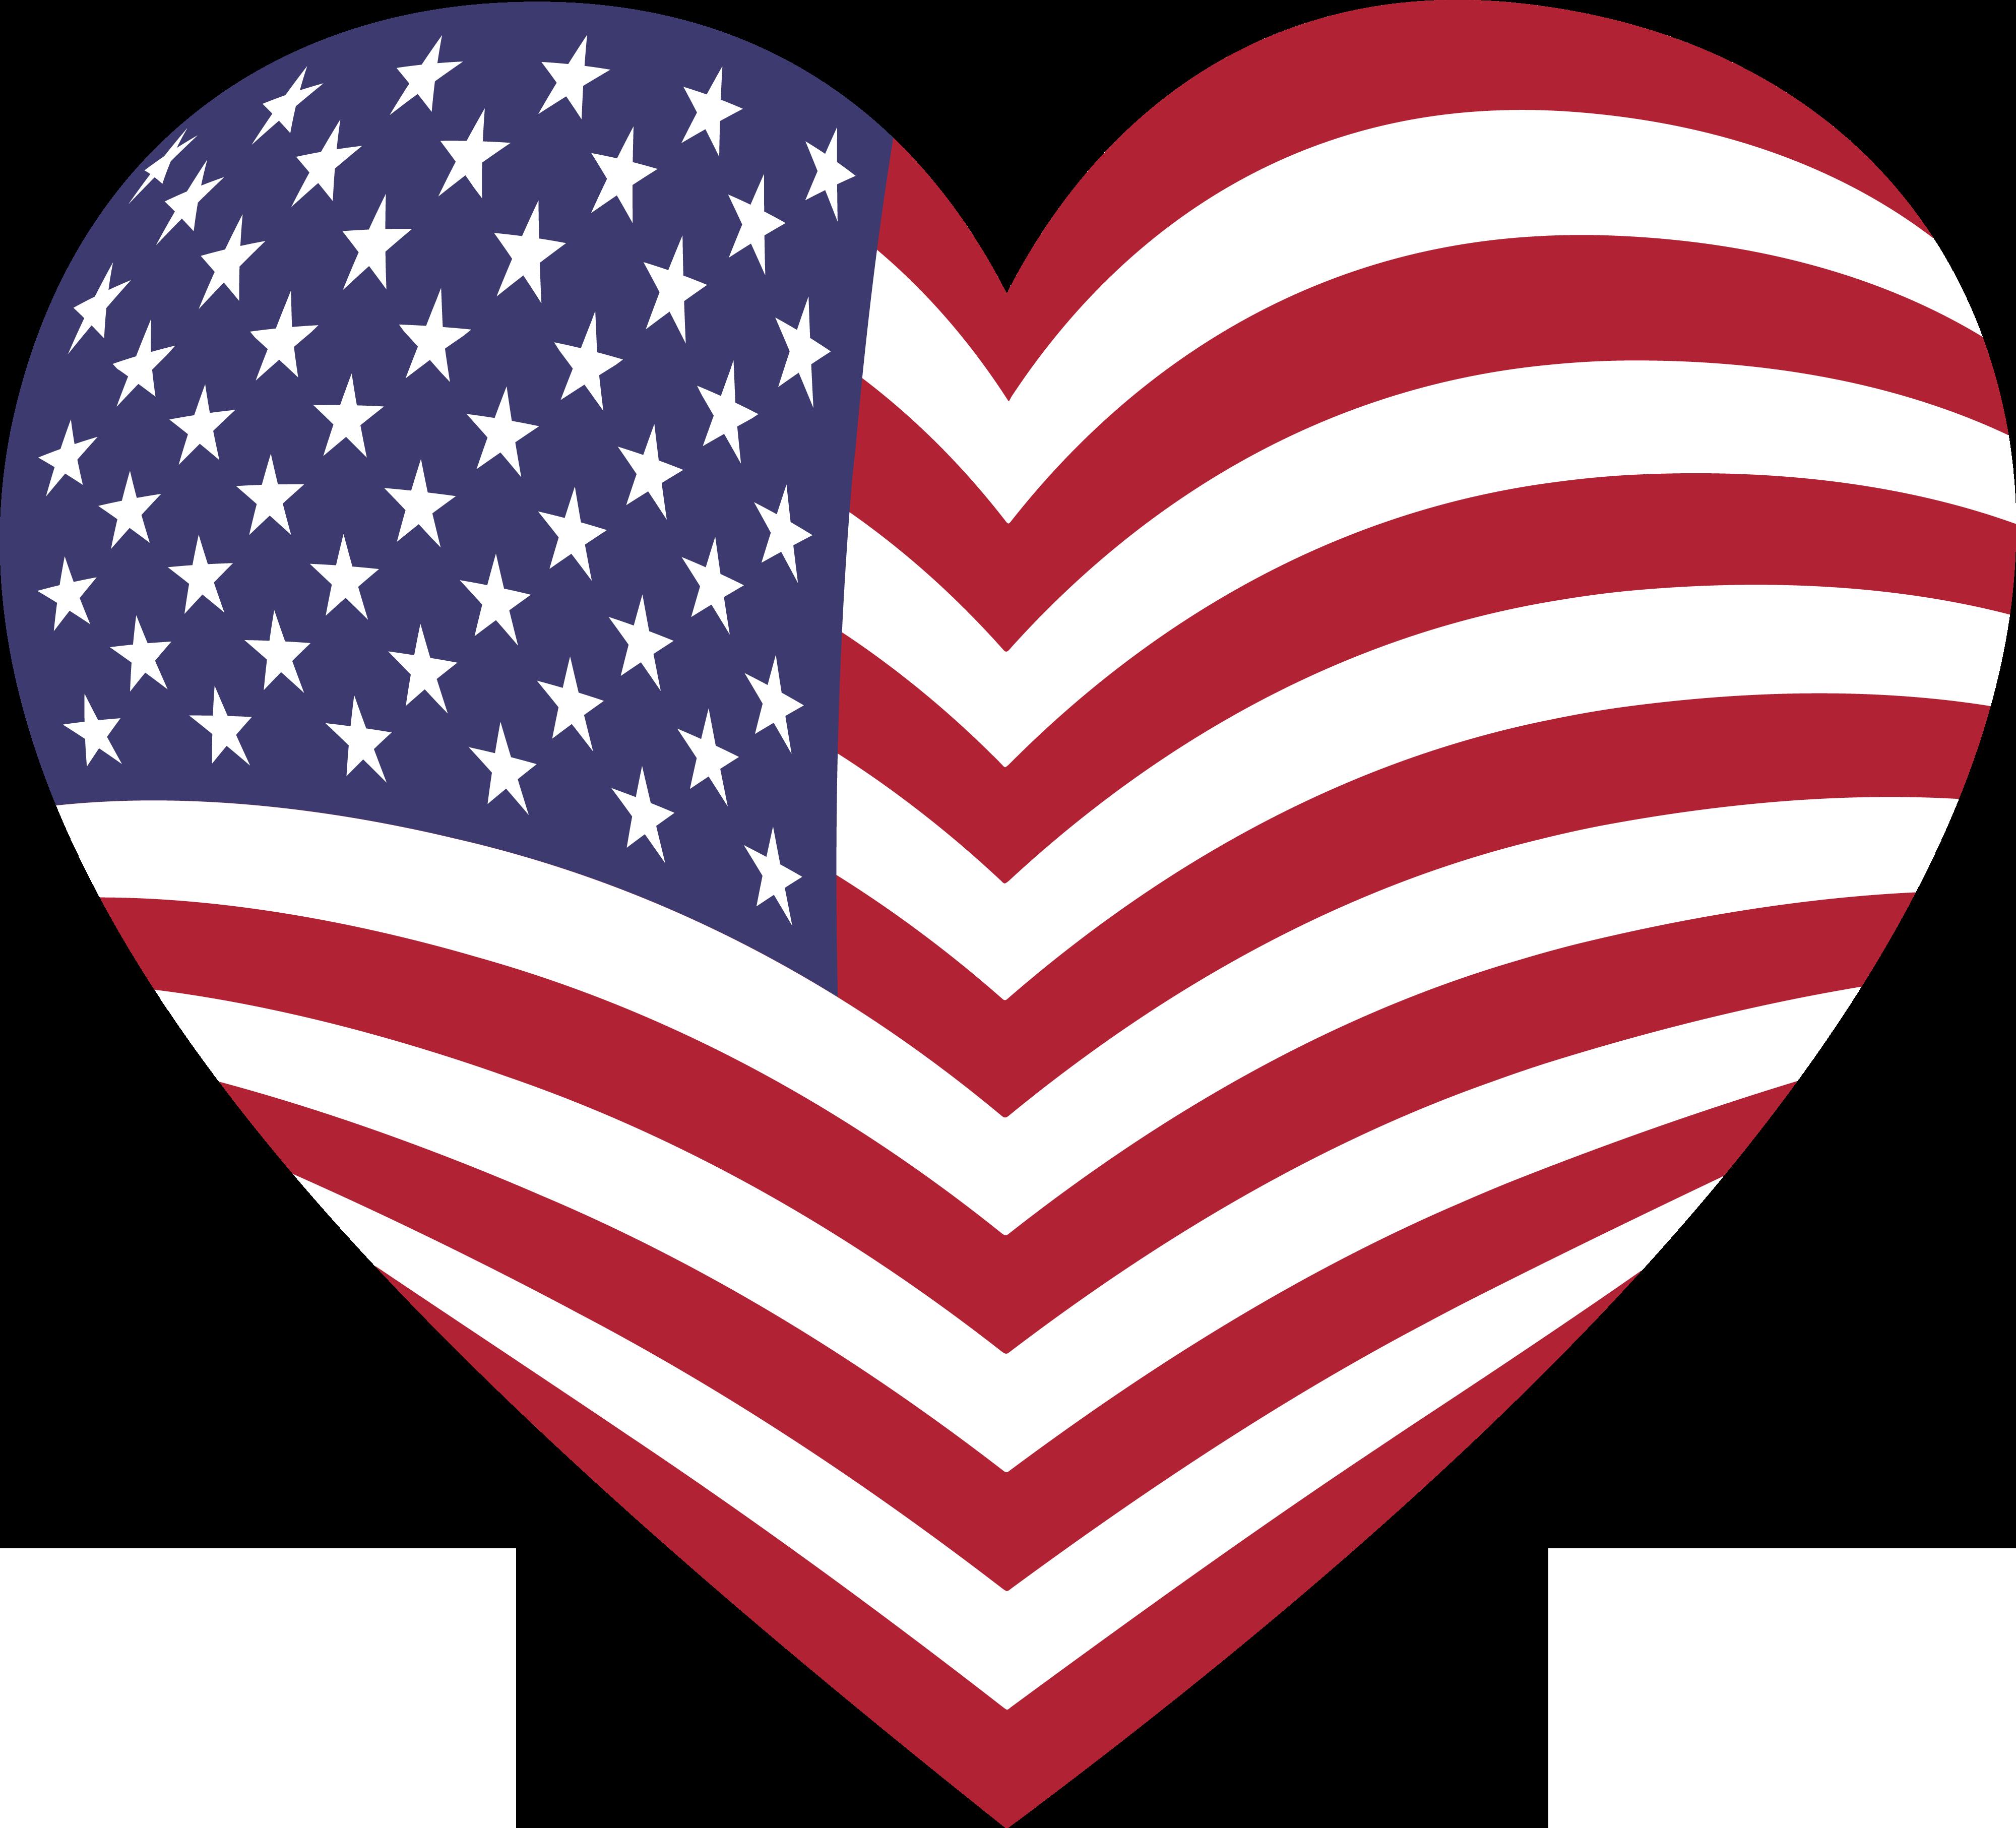 Heart clipart american flag #11.